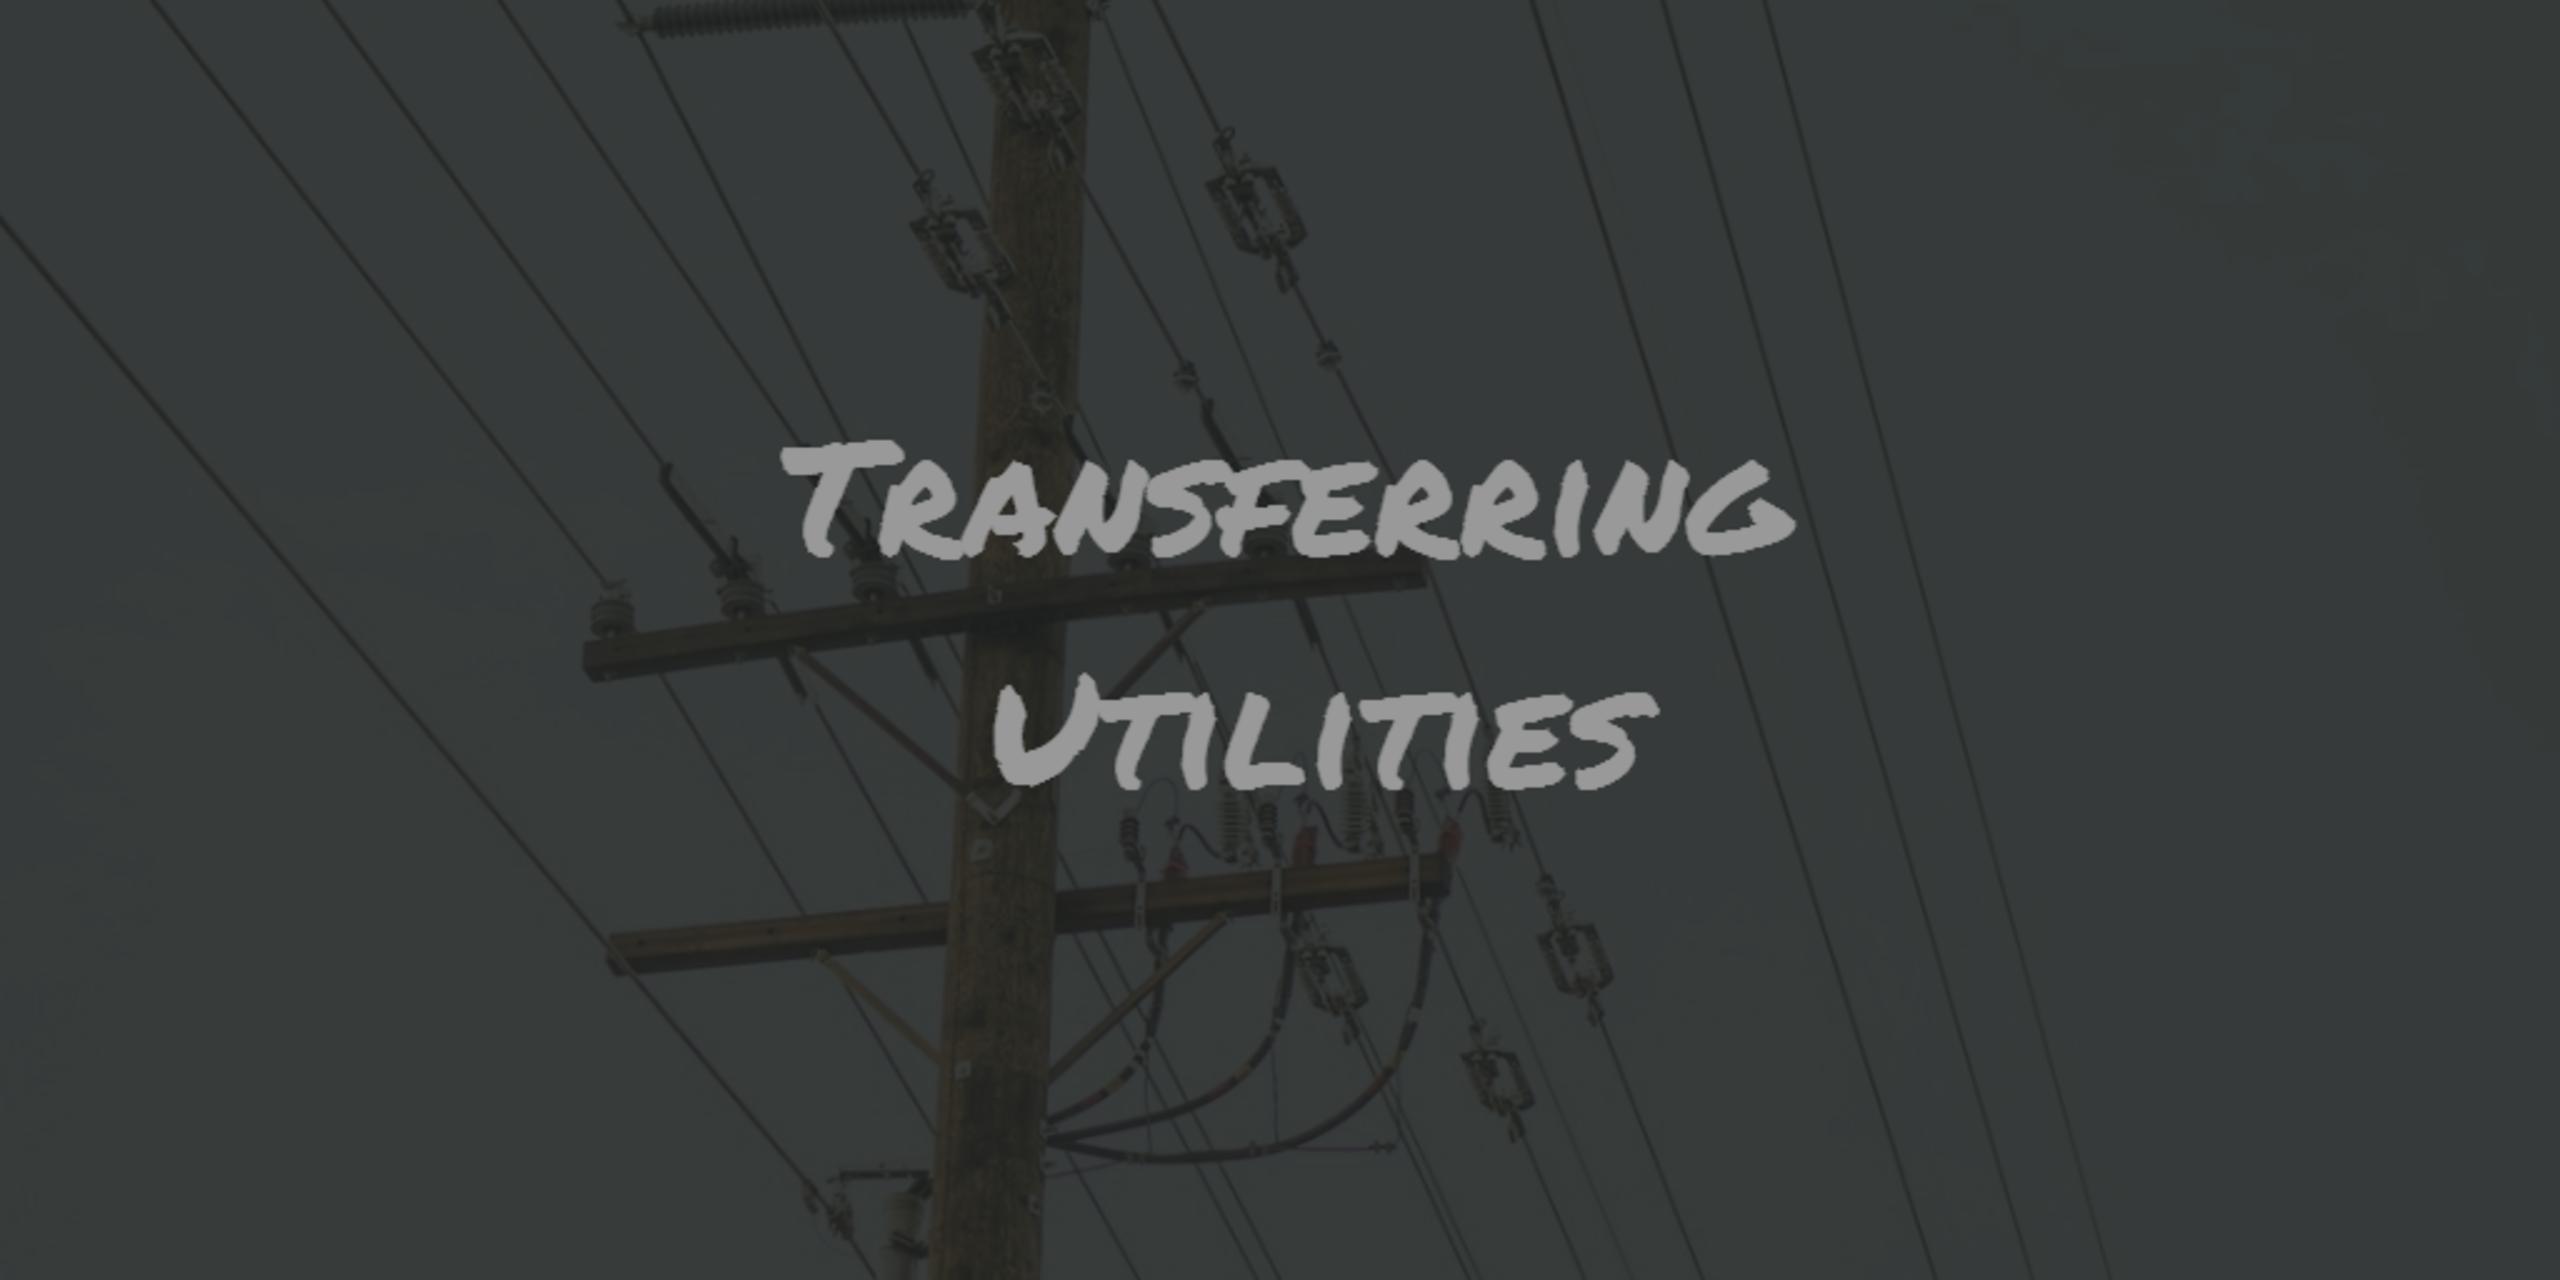 Transferring Utilities